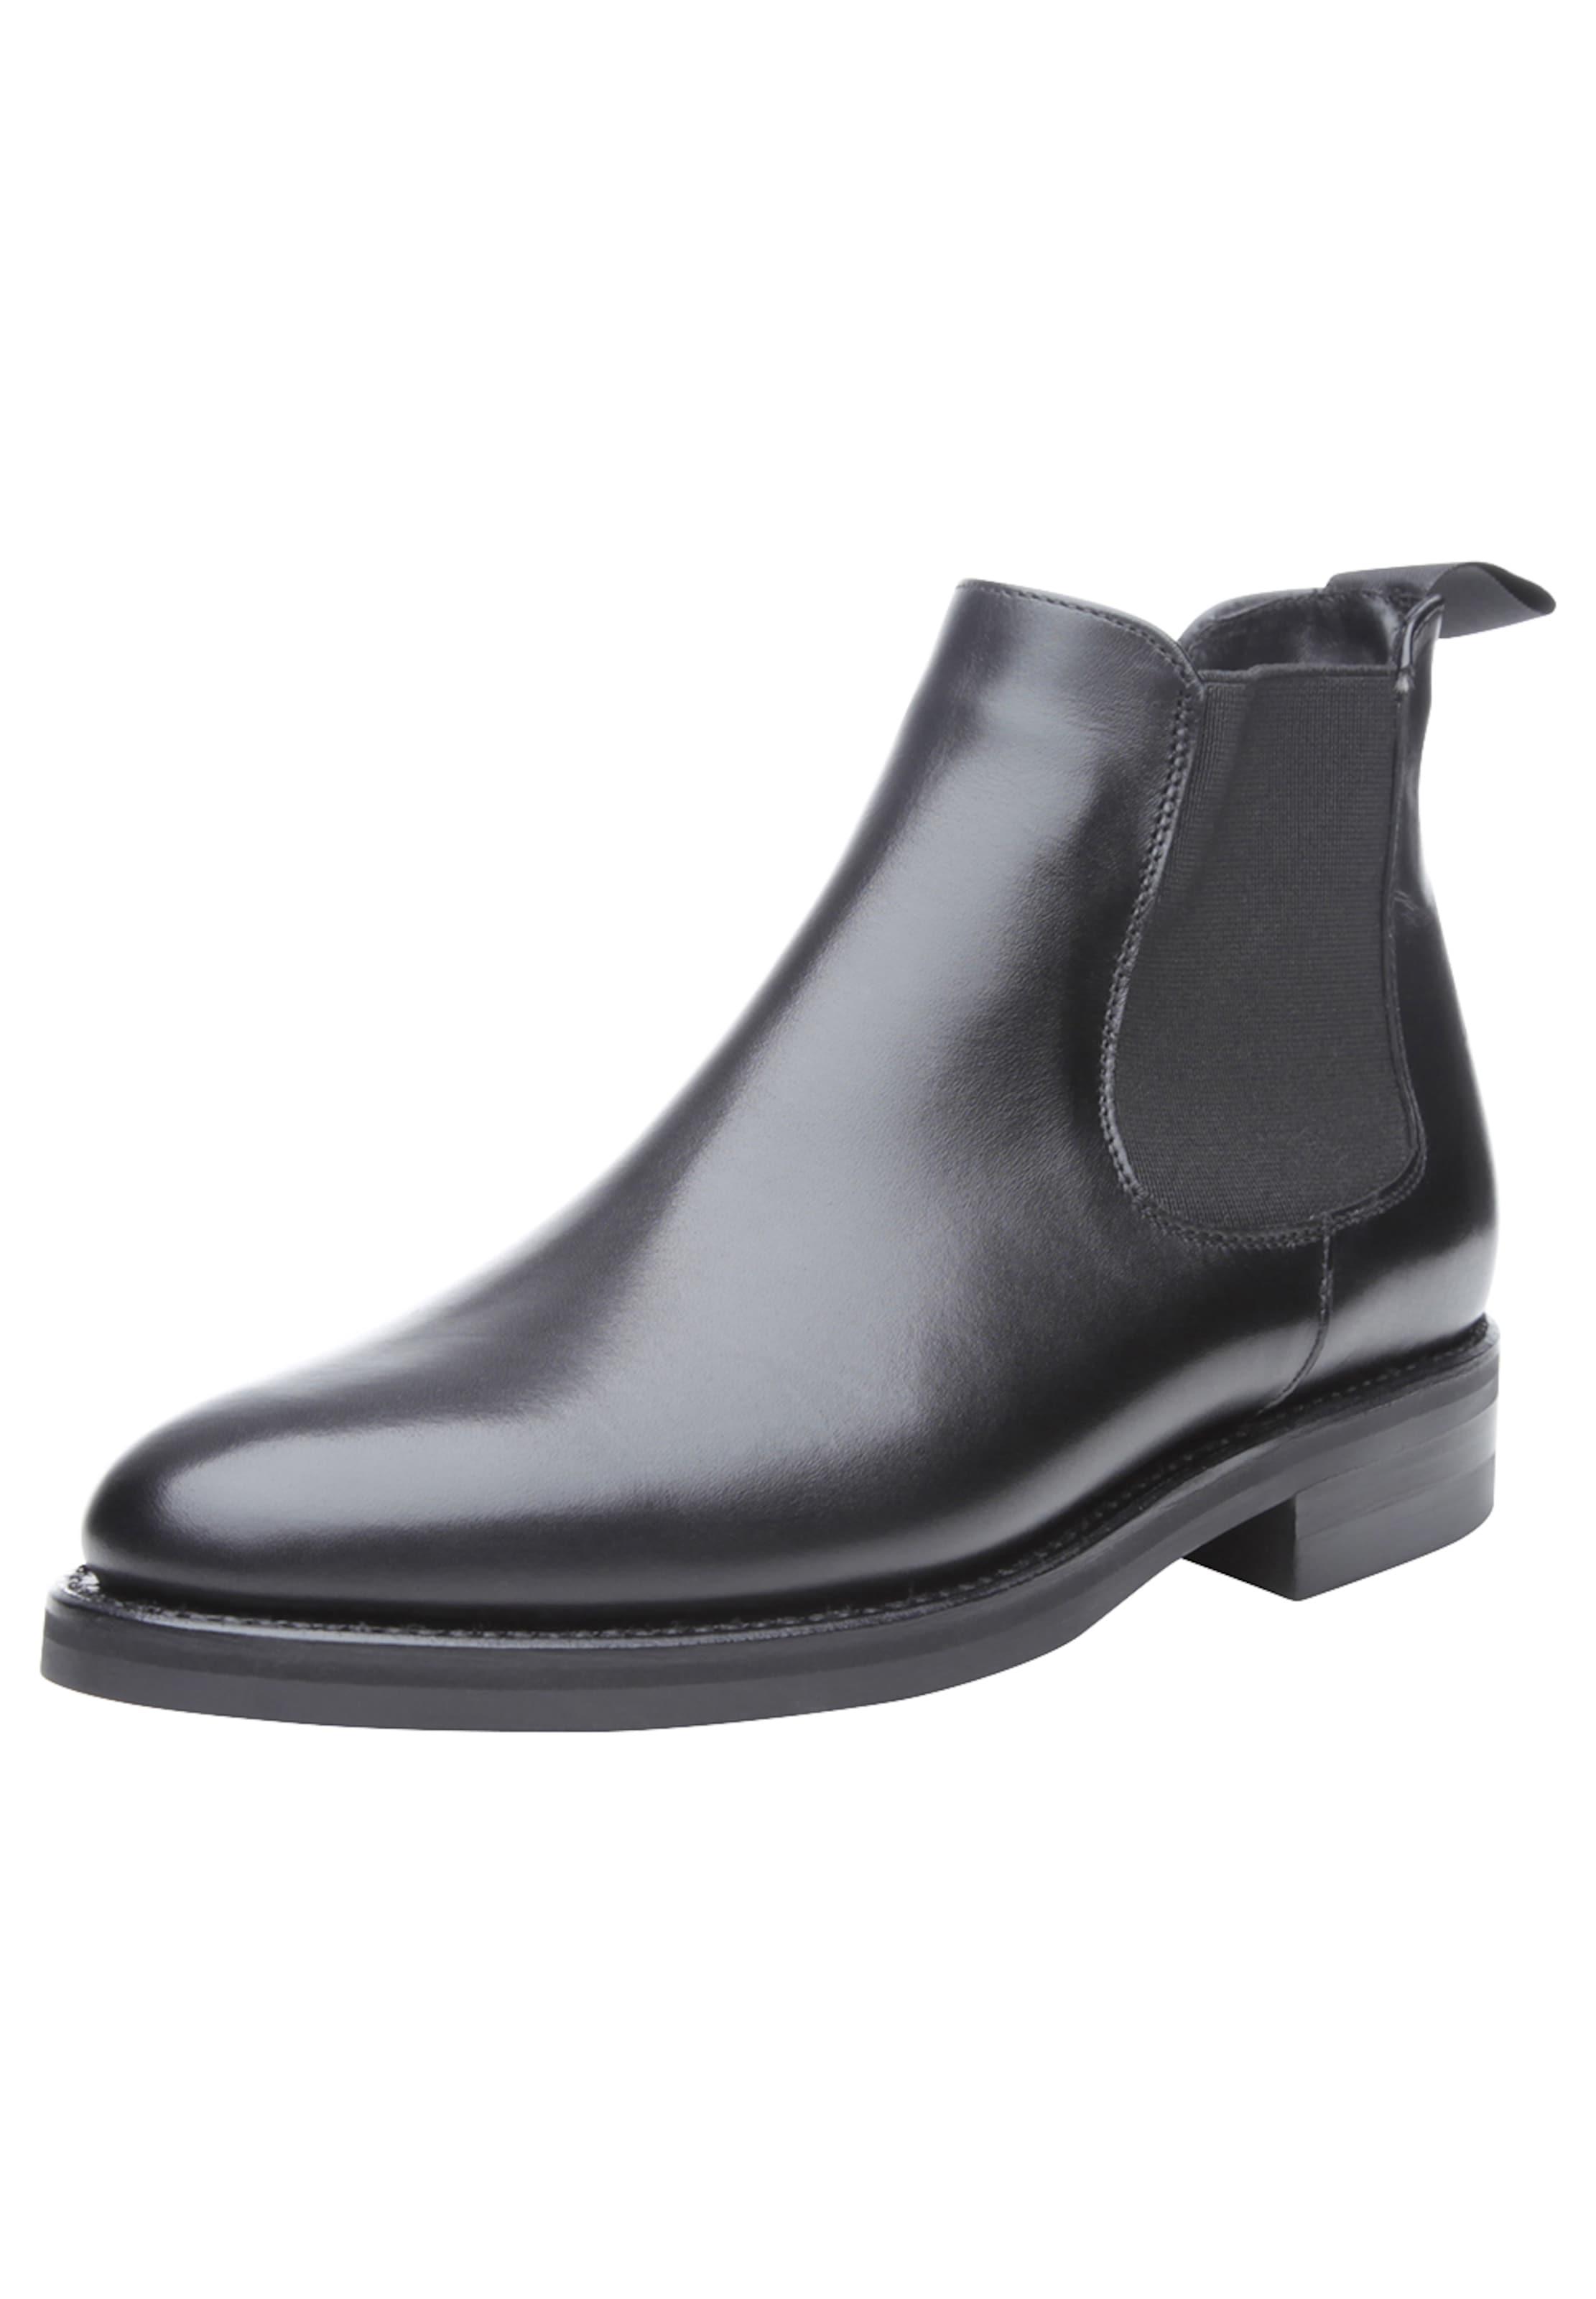 SHOEPASSION Winterboots No. 260 Verschleißfeste billige Schuhe